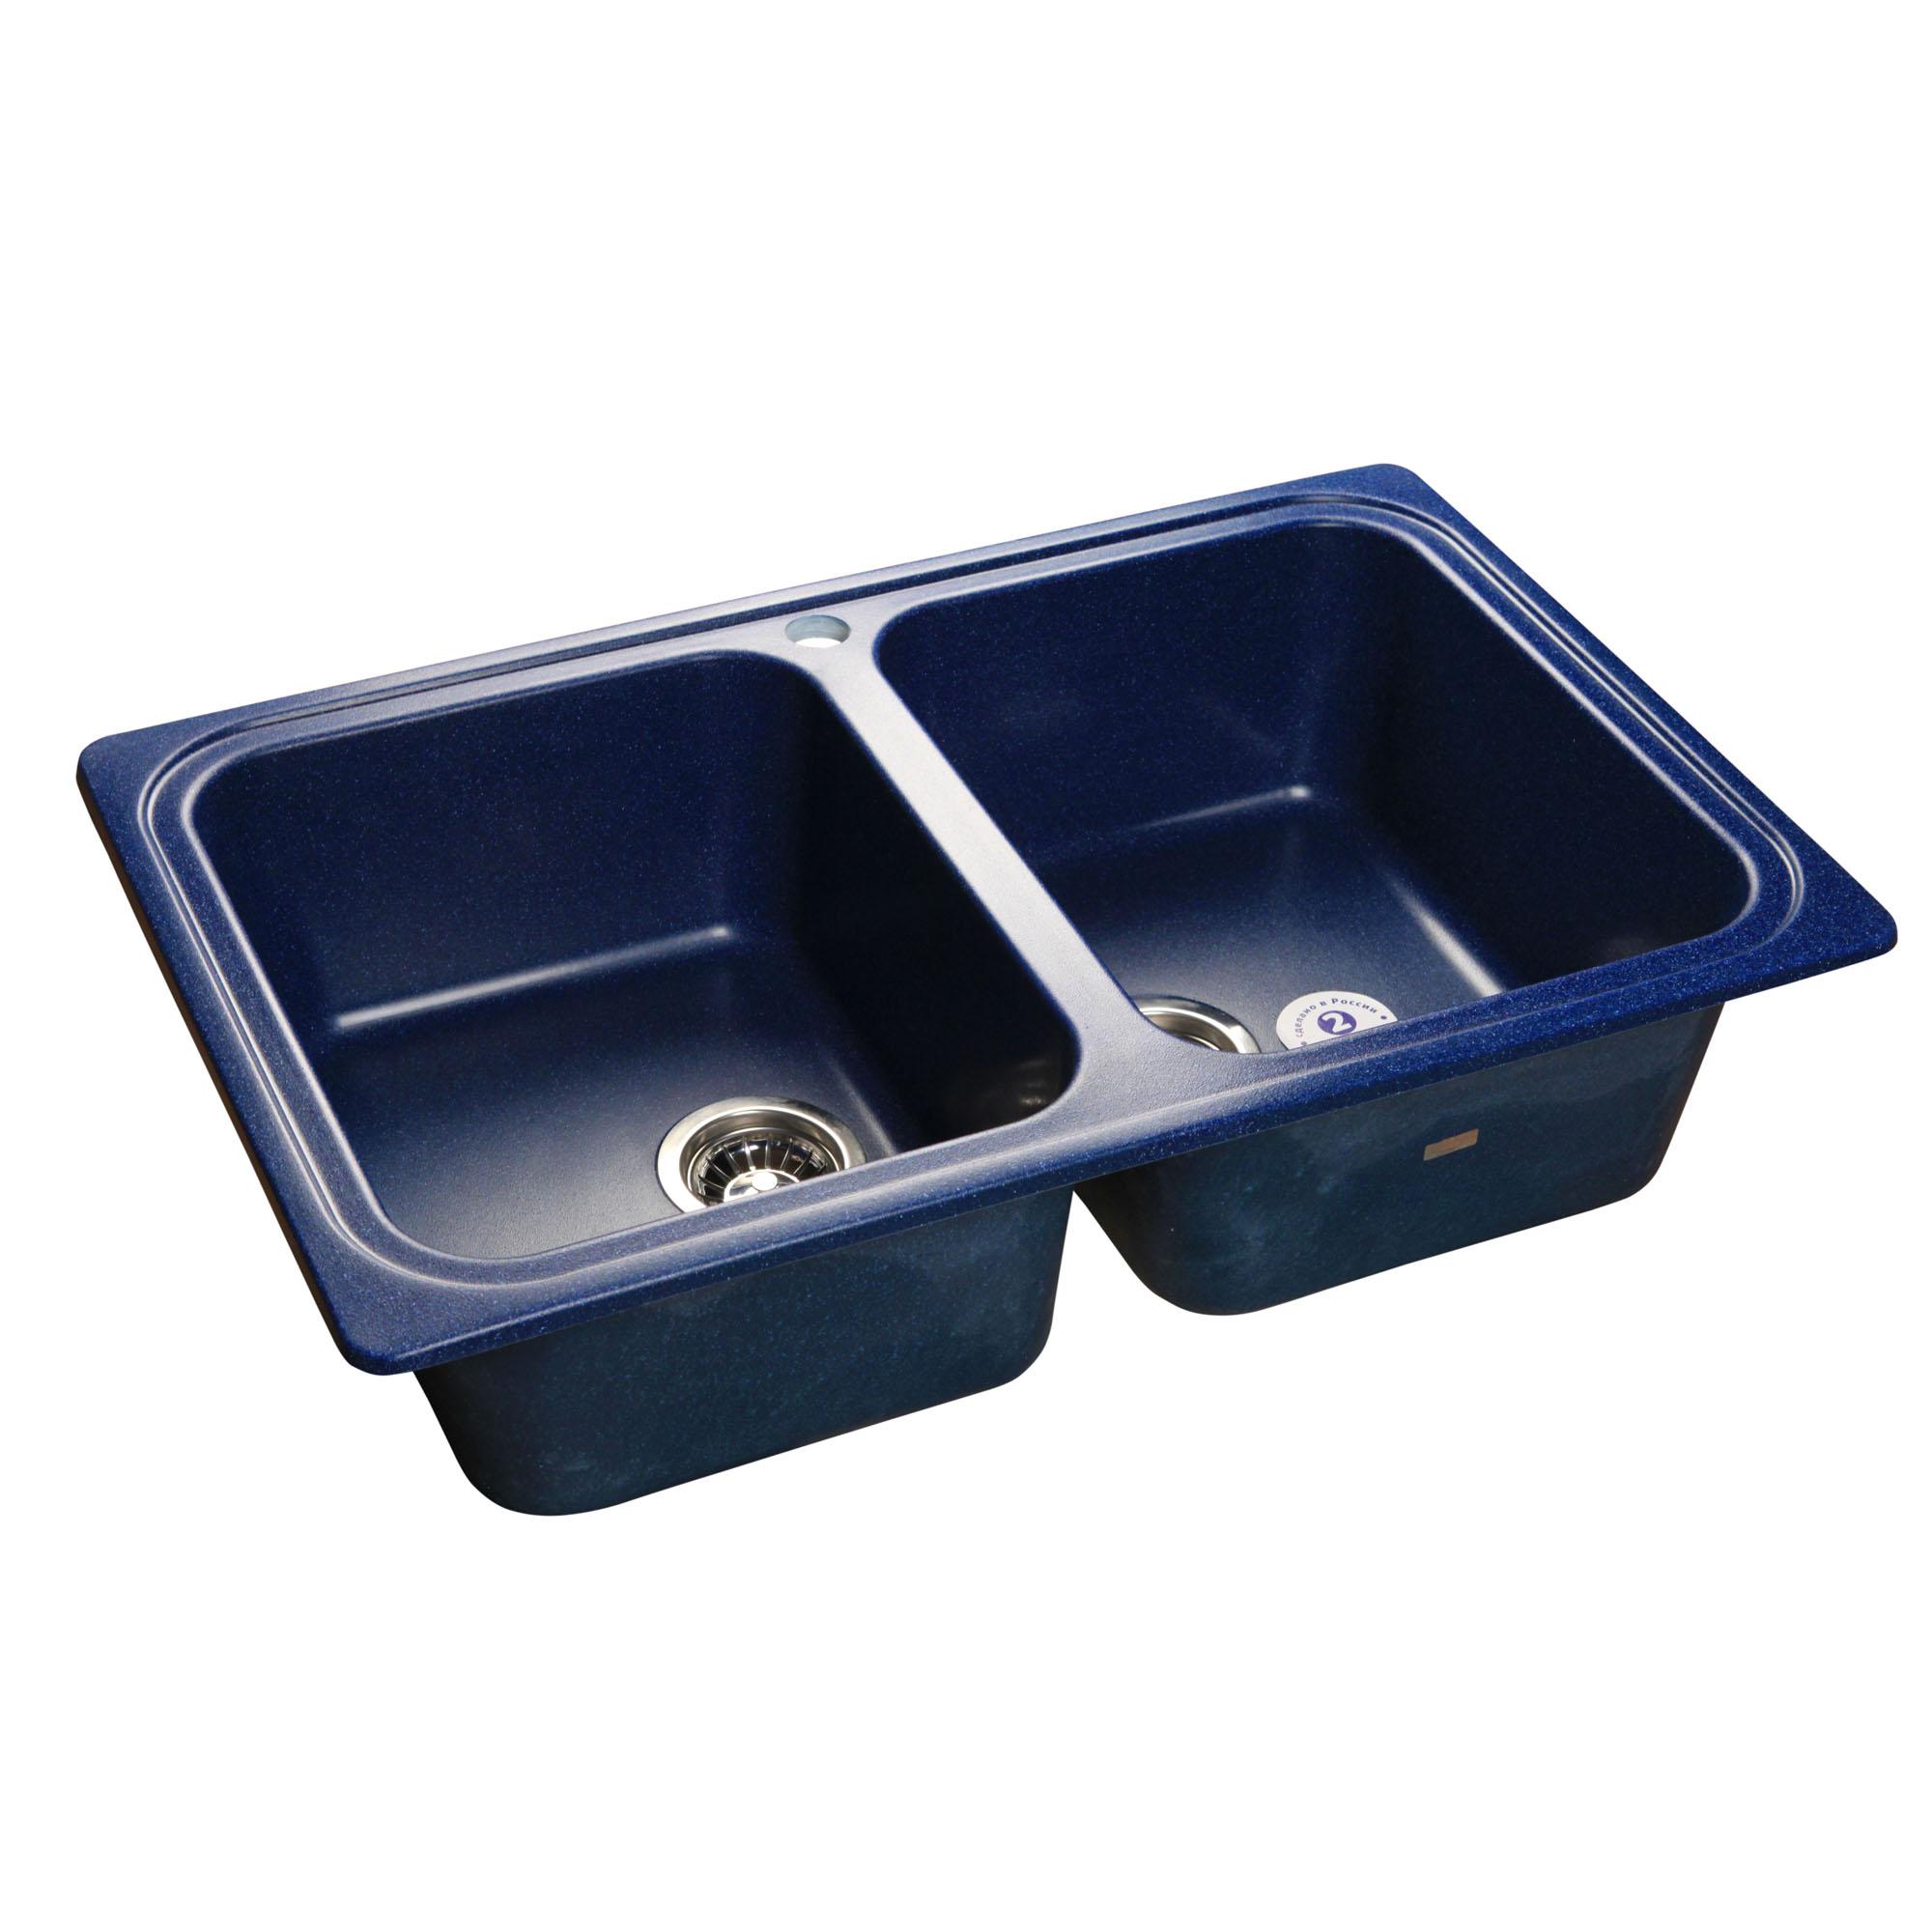 Кухонная мойка GranFest Standart GF-S780K синий мойка кухонная granfest гранит 780x510 gf s780k бежевая